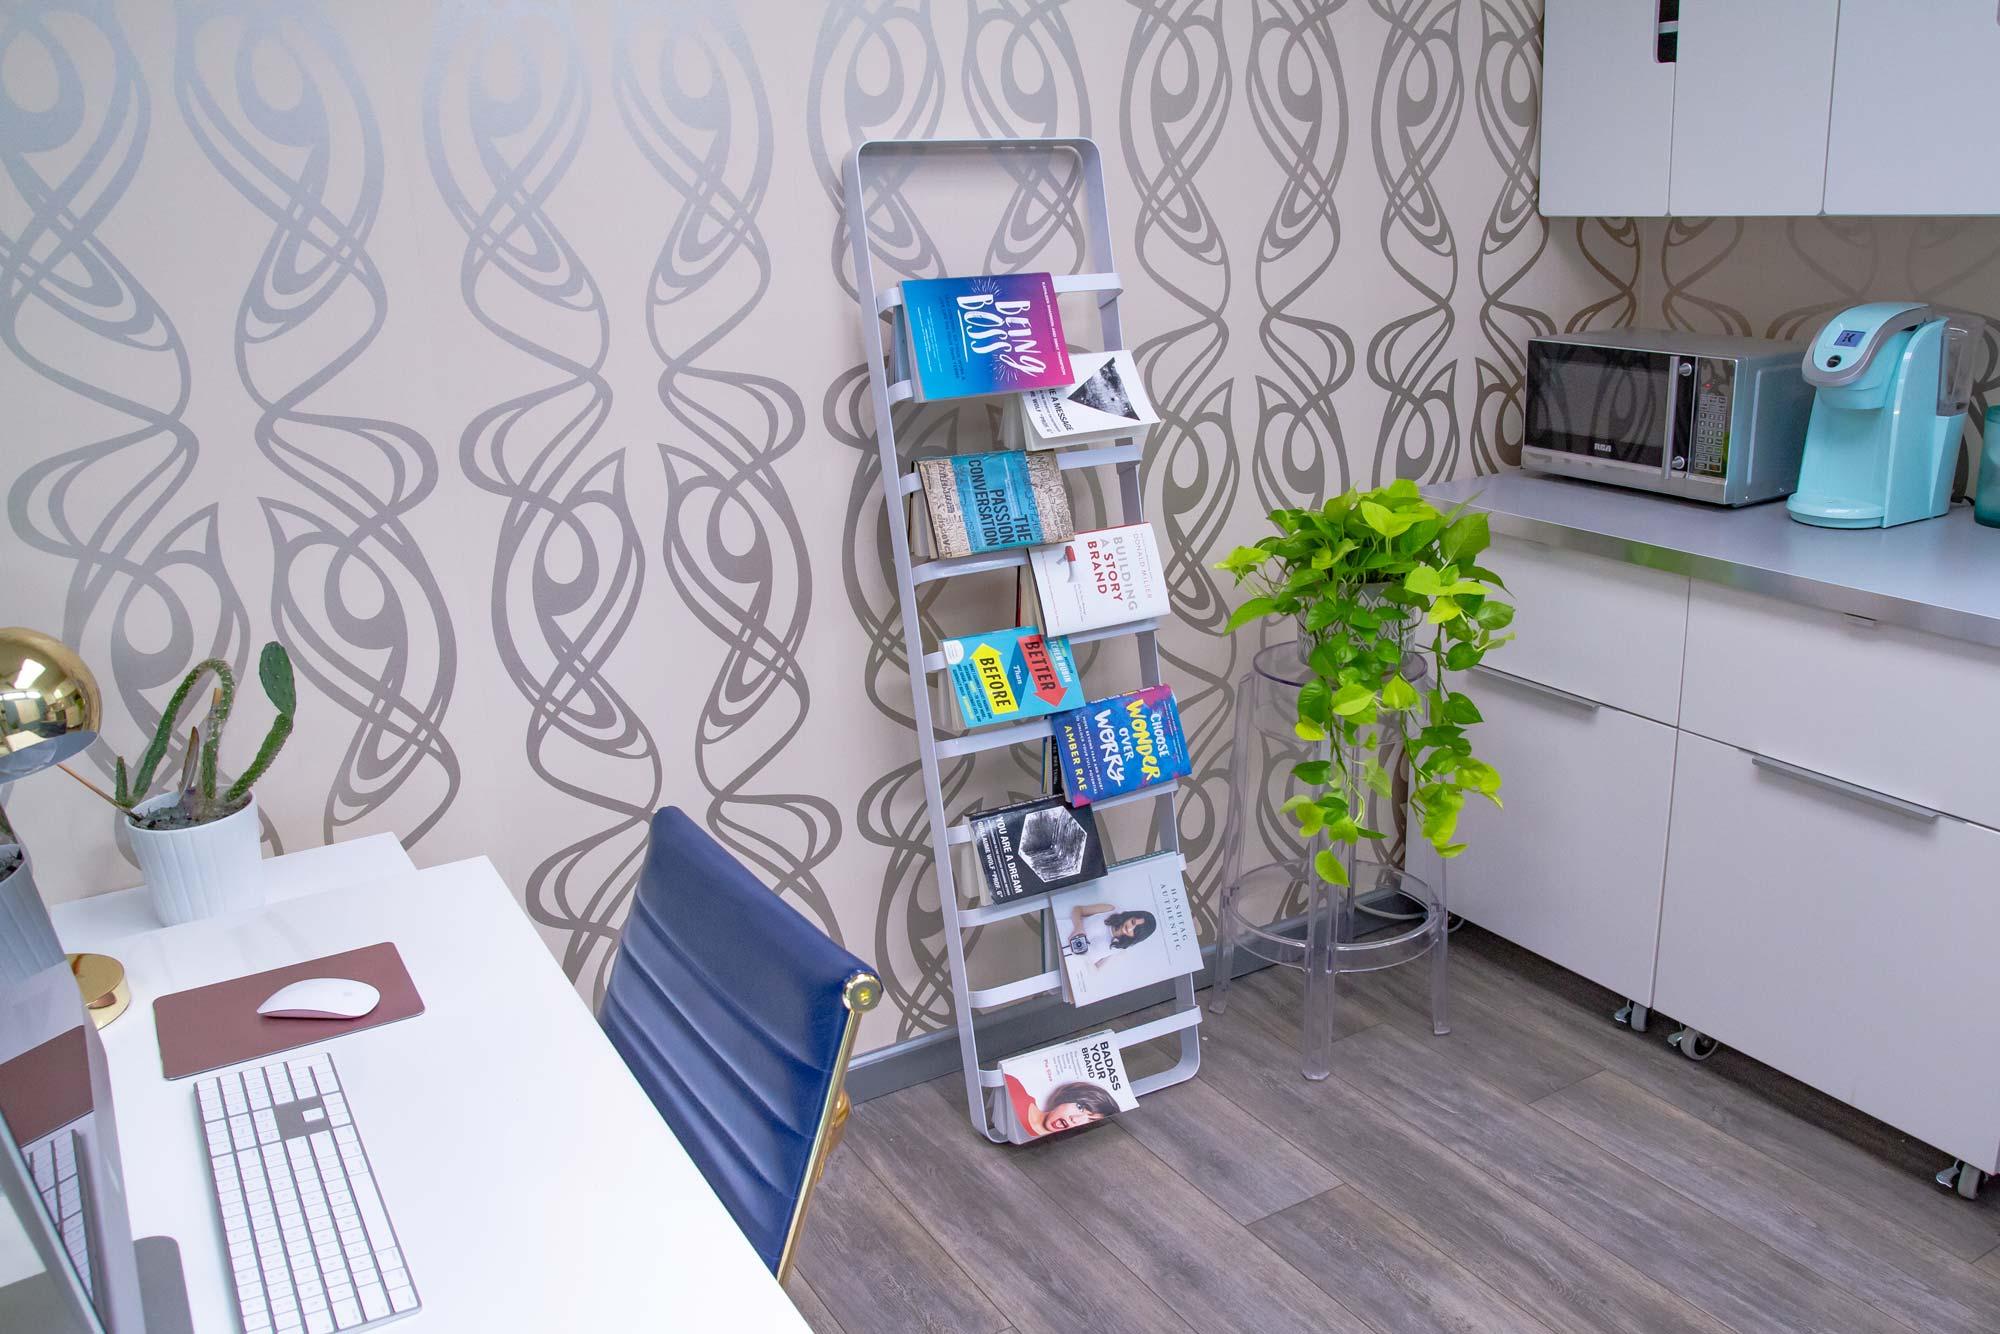 DesignGood HQ inspirational book shelf